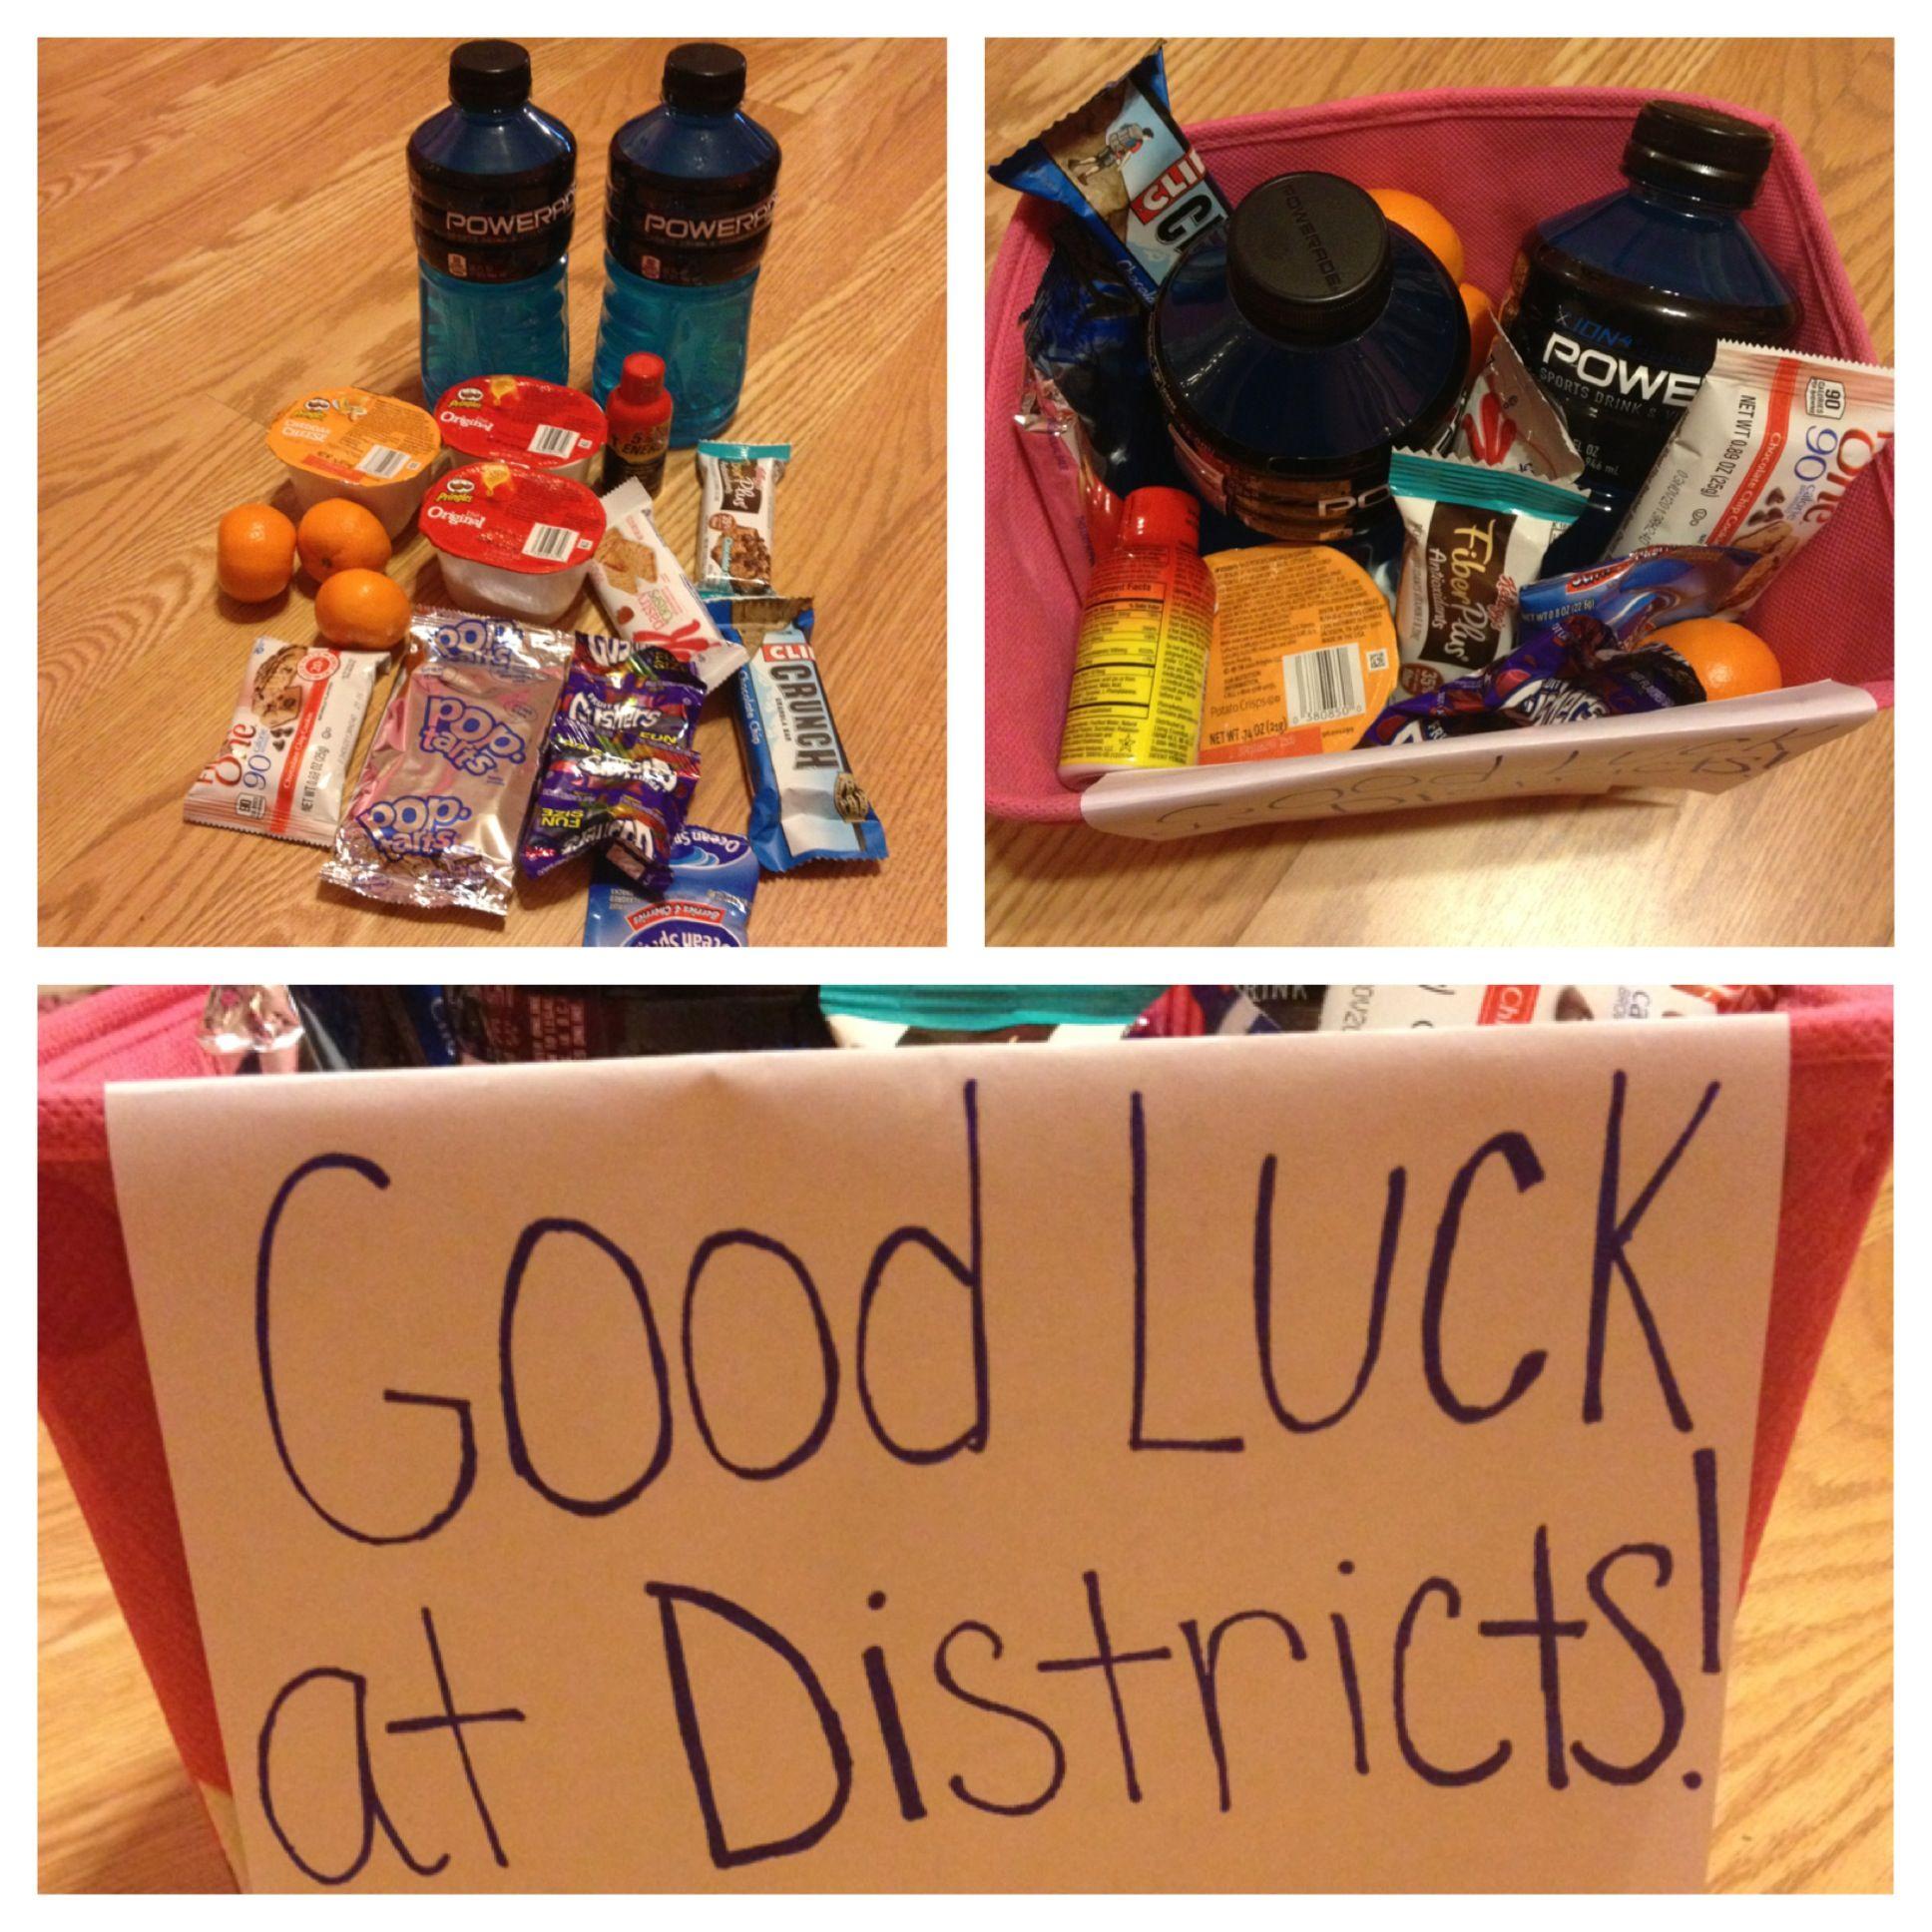 Good luck basket I made for a friend | Stuff I did | Pinterest ...